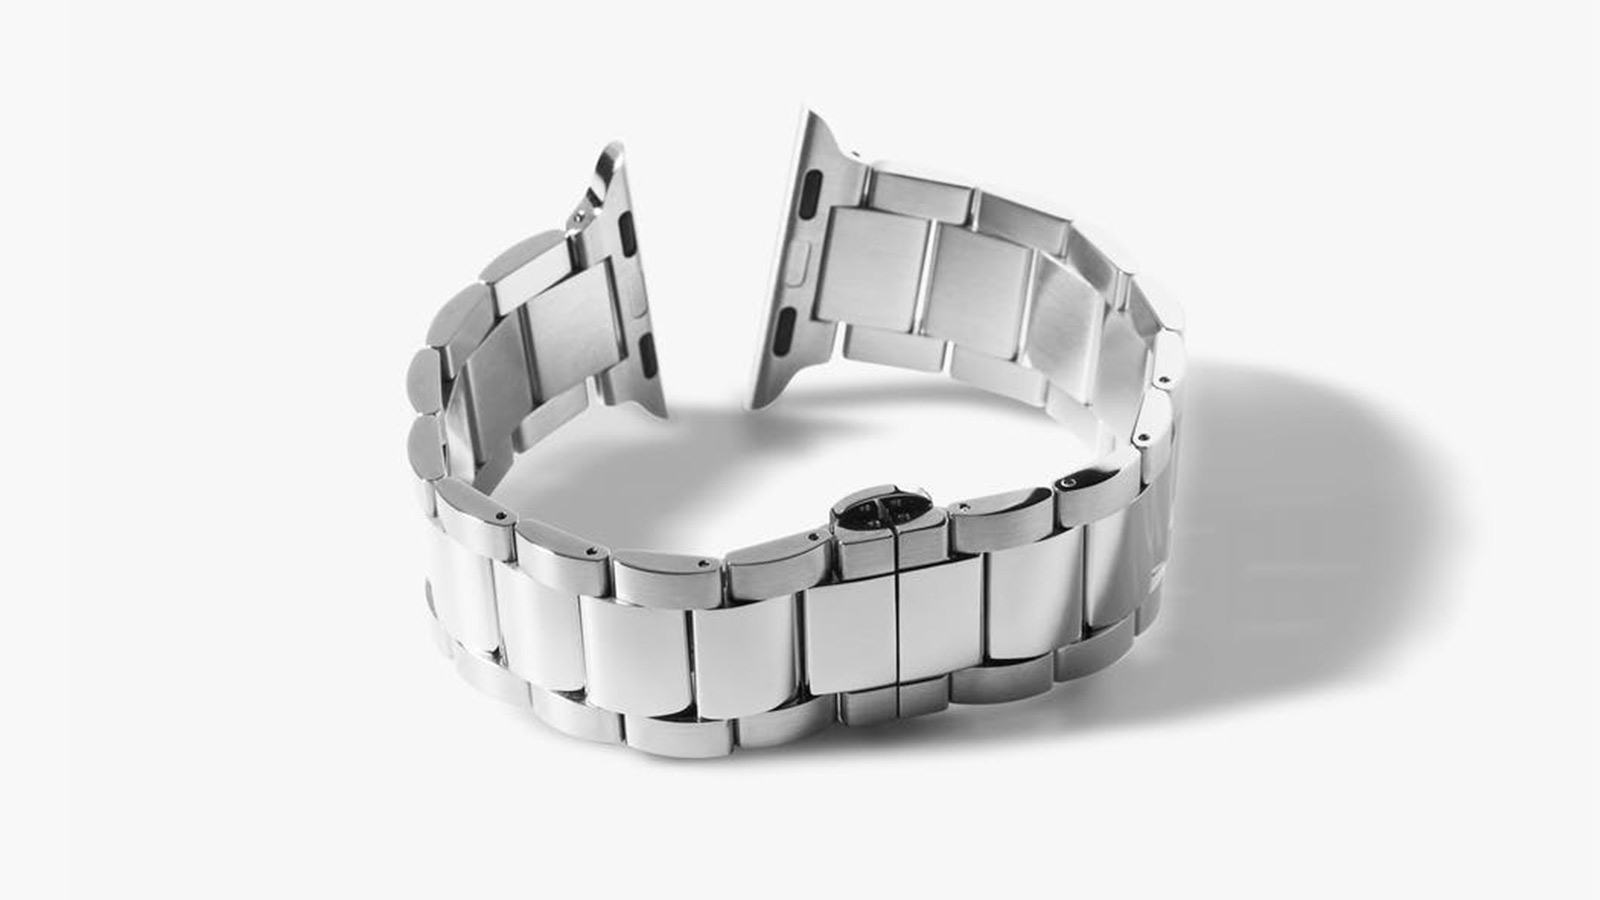 Shinola Stainless Steel Bracelet For Apple Watch